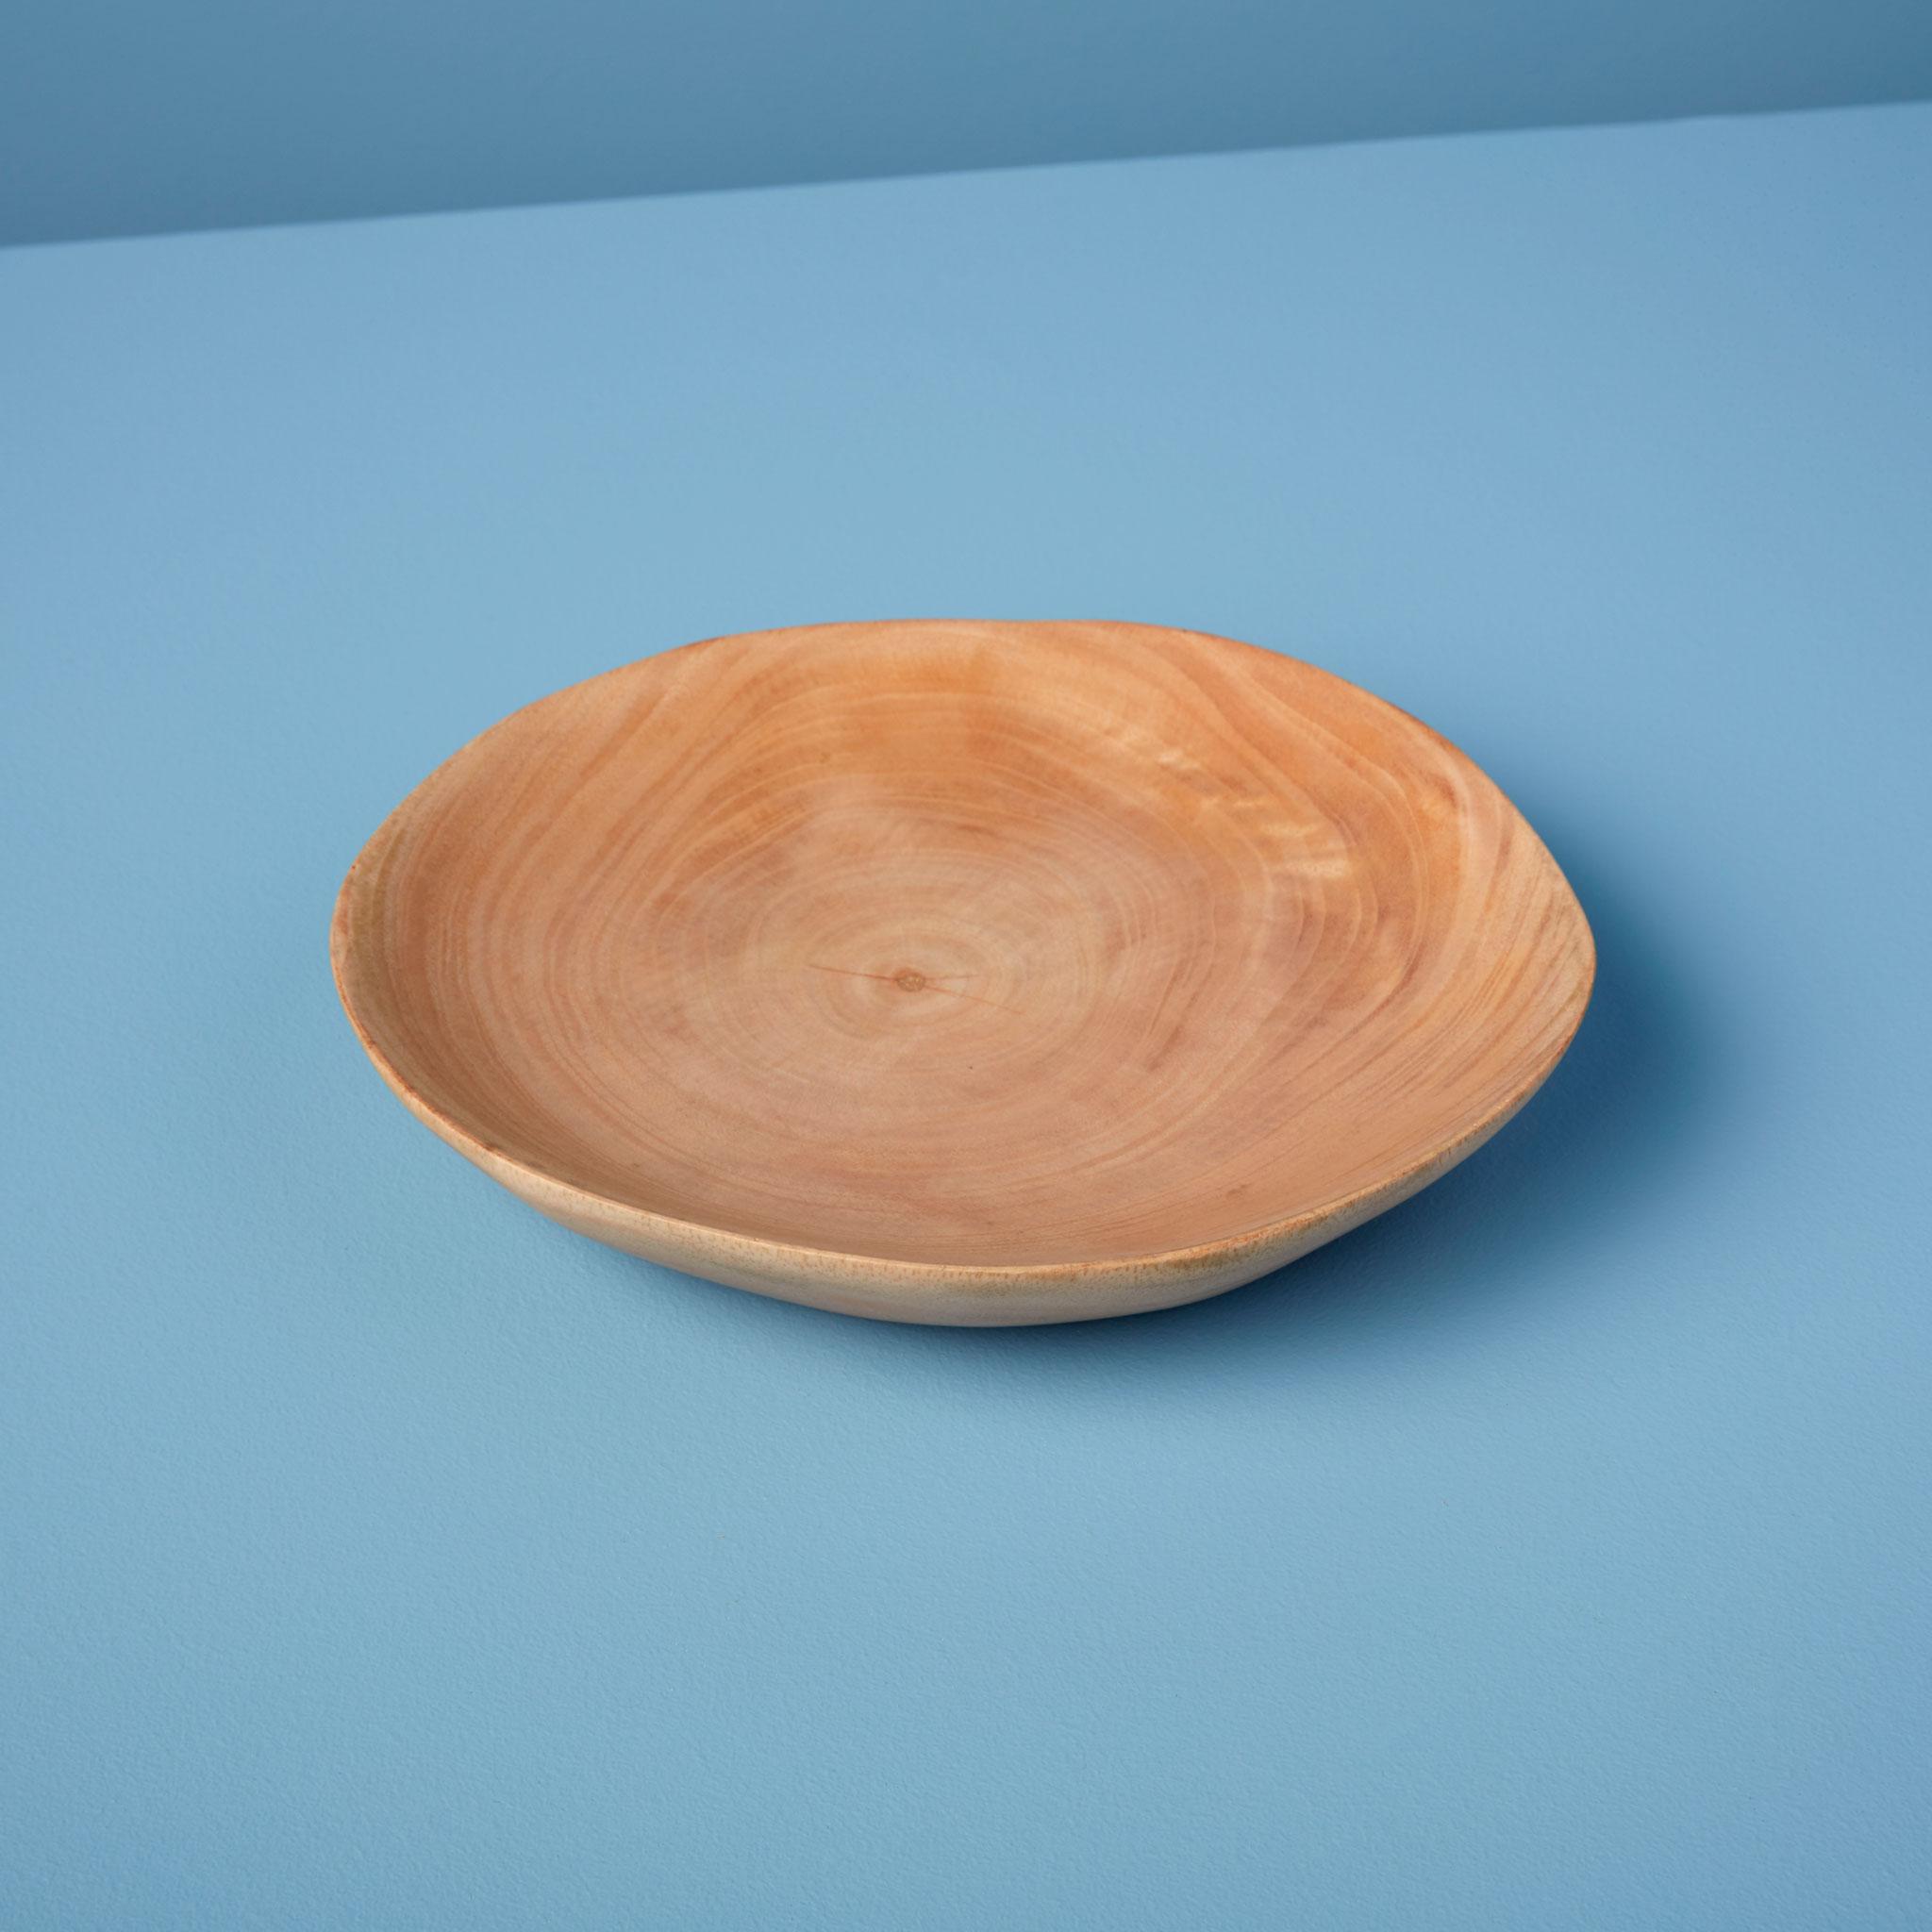 Be-Home_Mango-Wood-Side-Plate_34-04